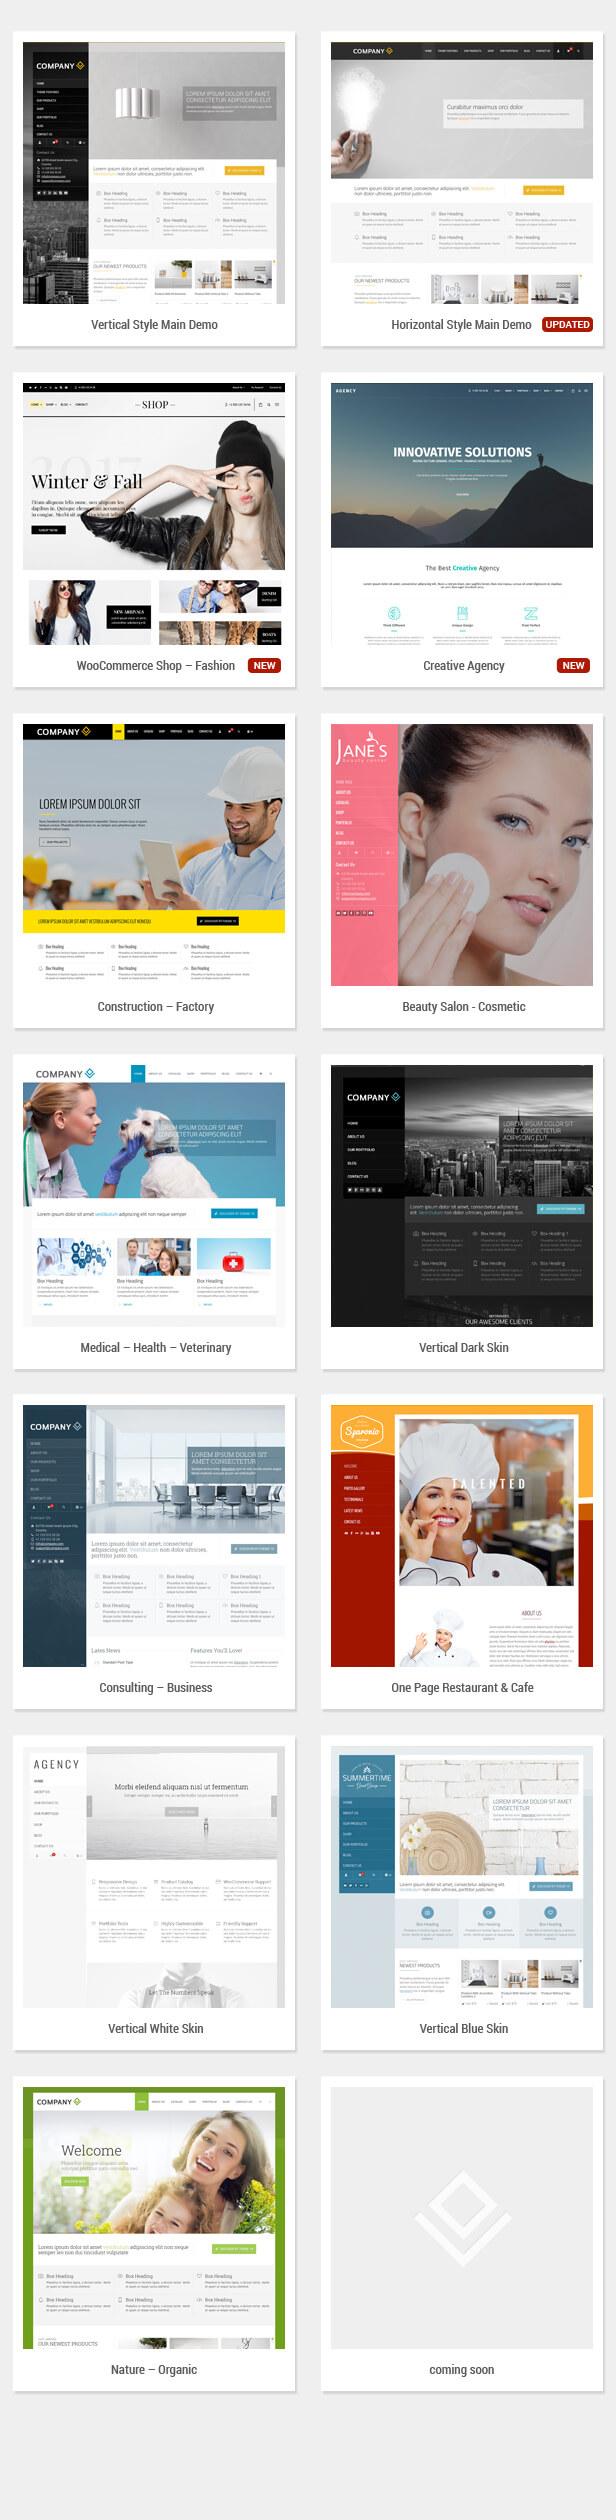 dashboard new 02 - RT-Theme 19 | Multi-Purpose WordPress Theme